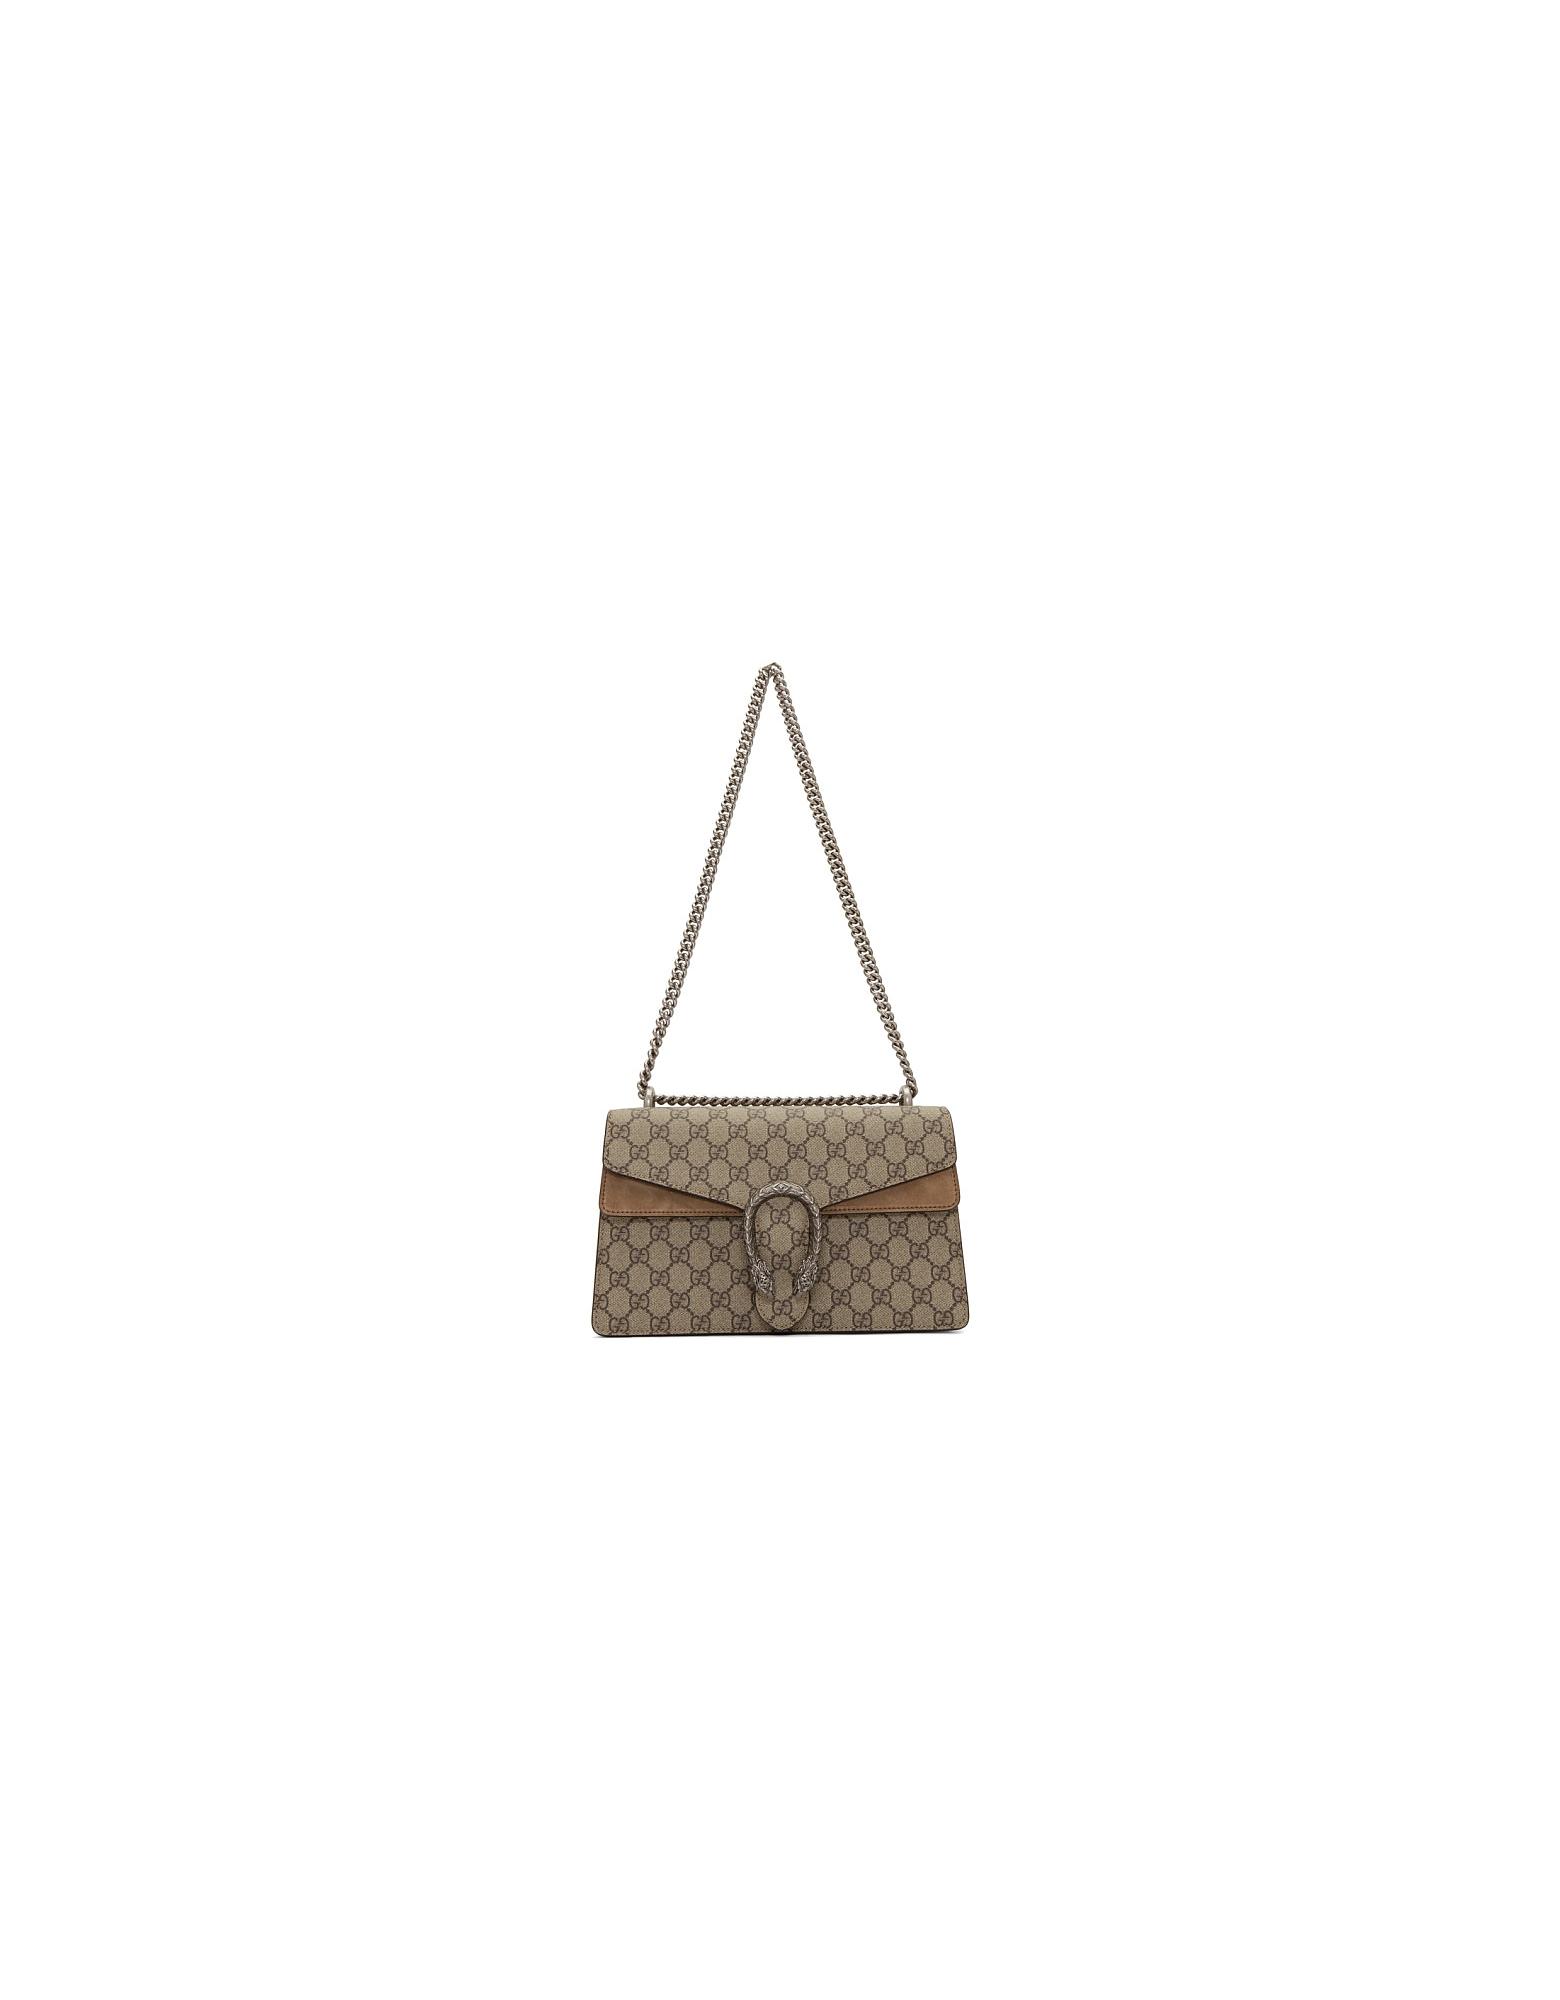 Gucci Designer Handbags, Beige Small Dionysus Shoulder Bag